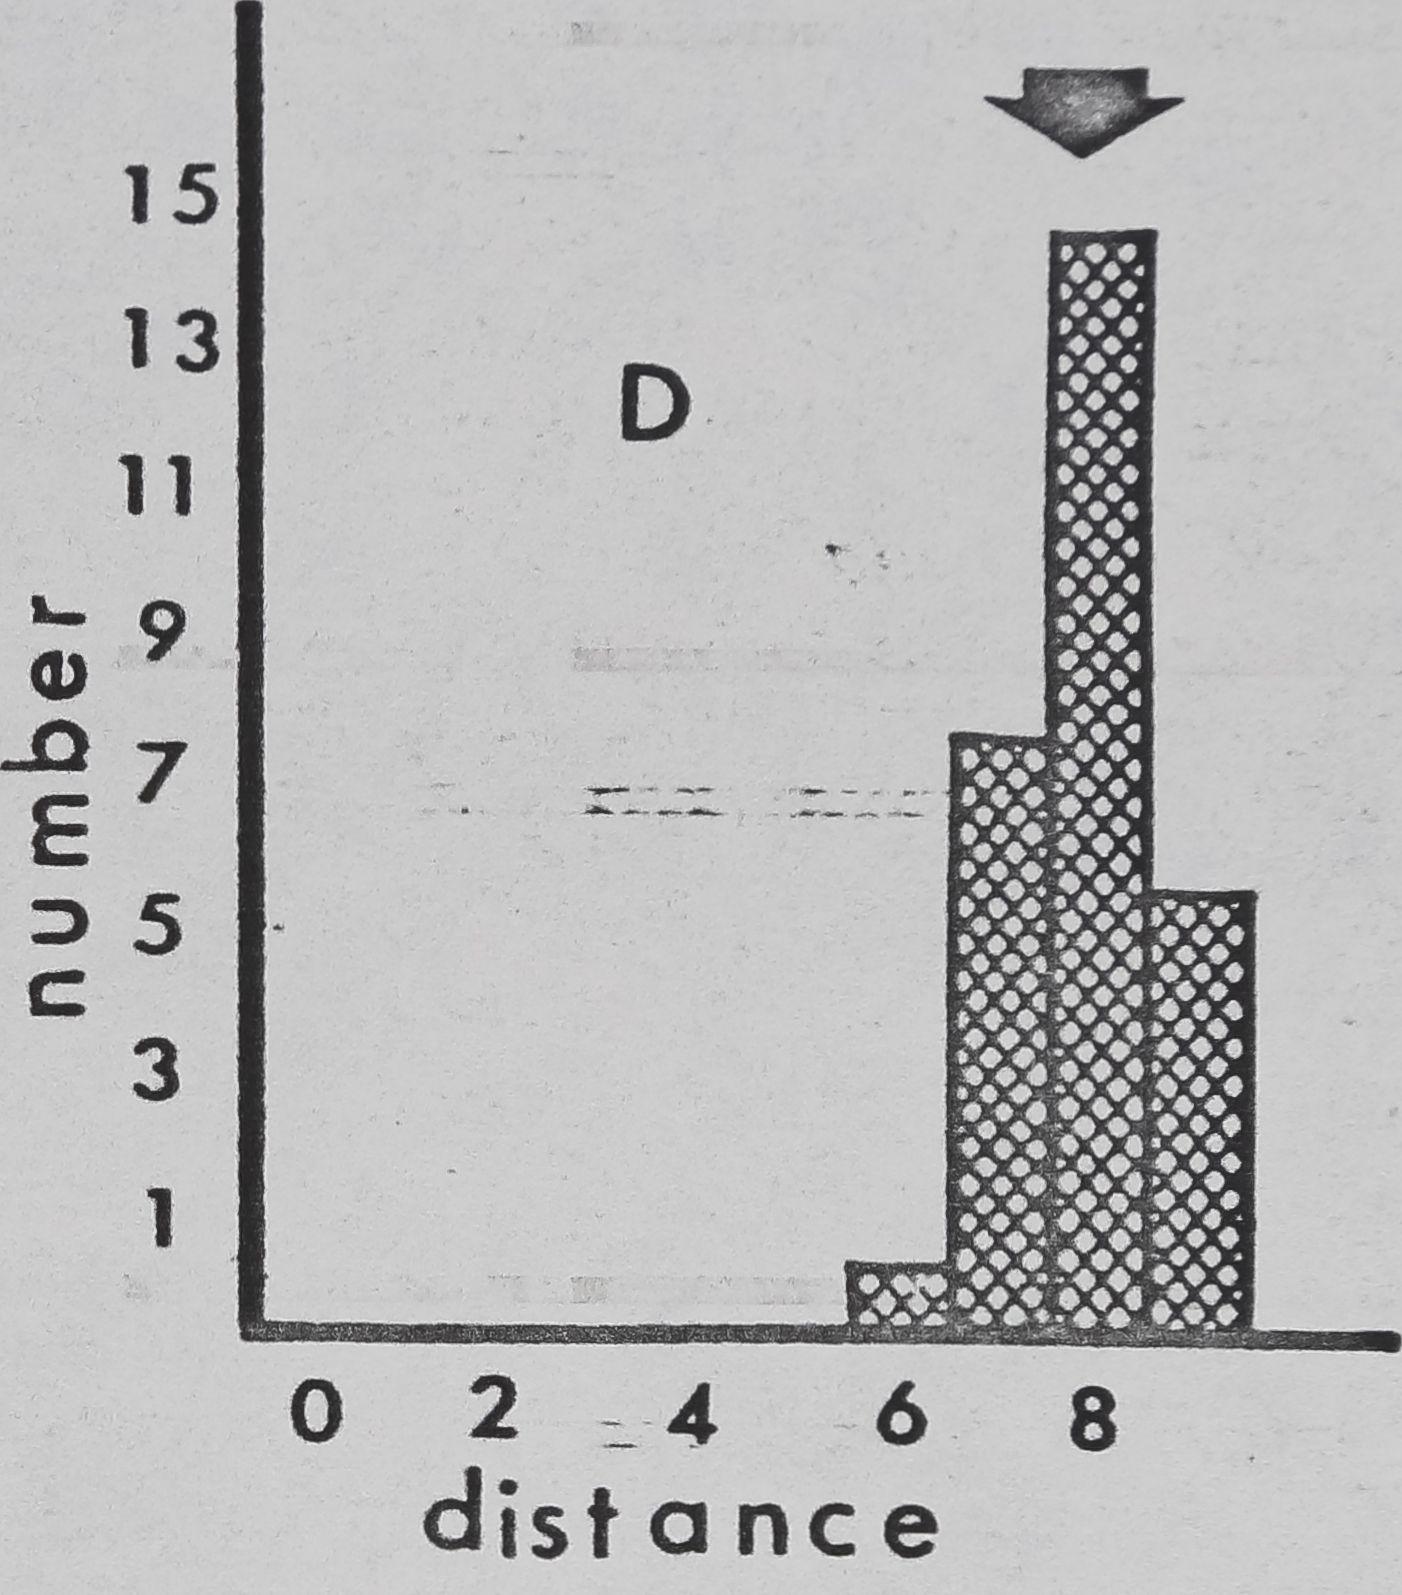 1979-ComparativeStudiesOfDictynaAnd-9